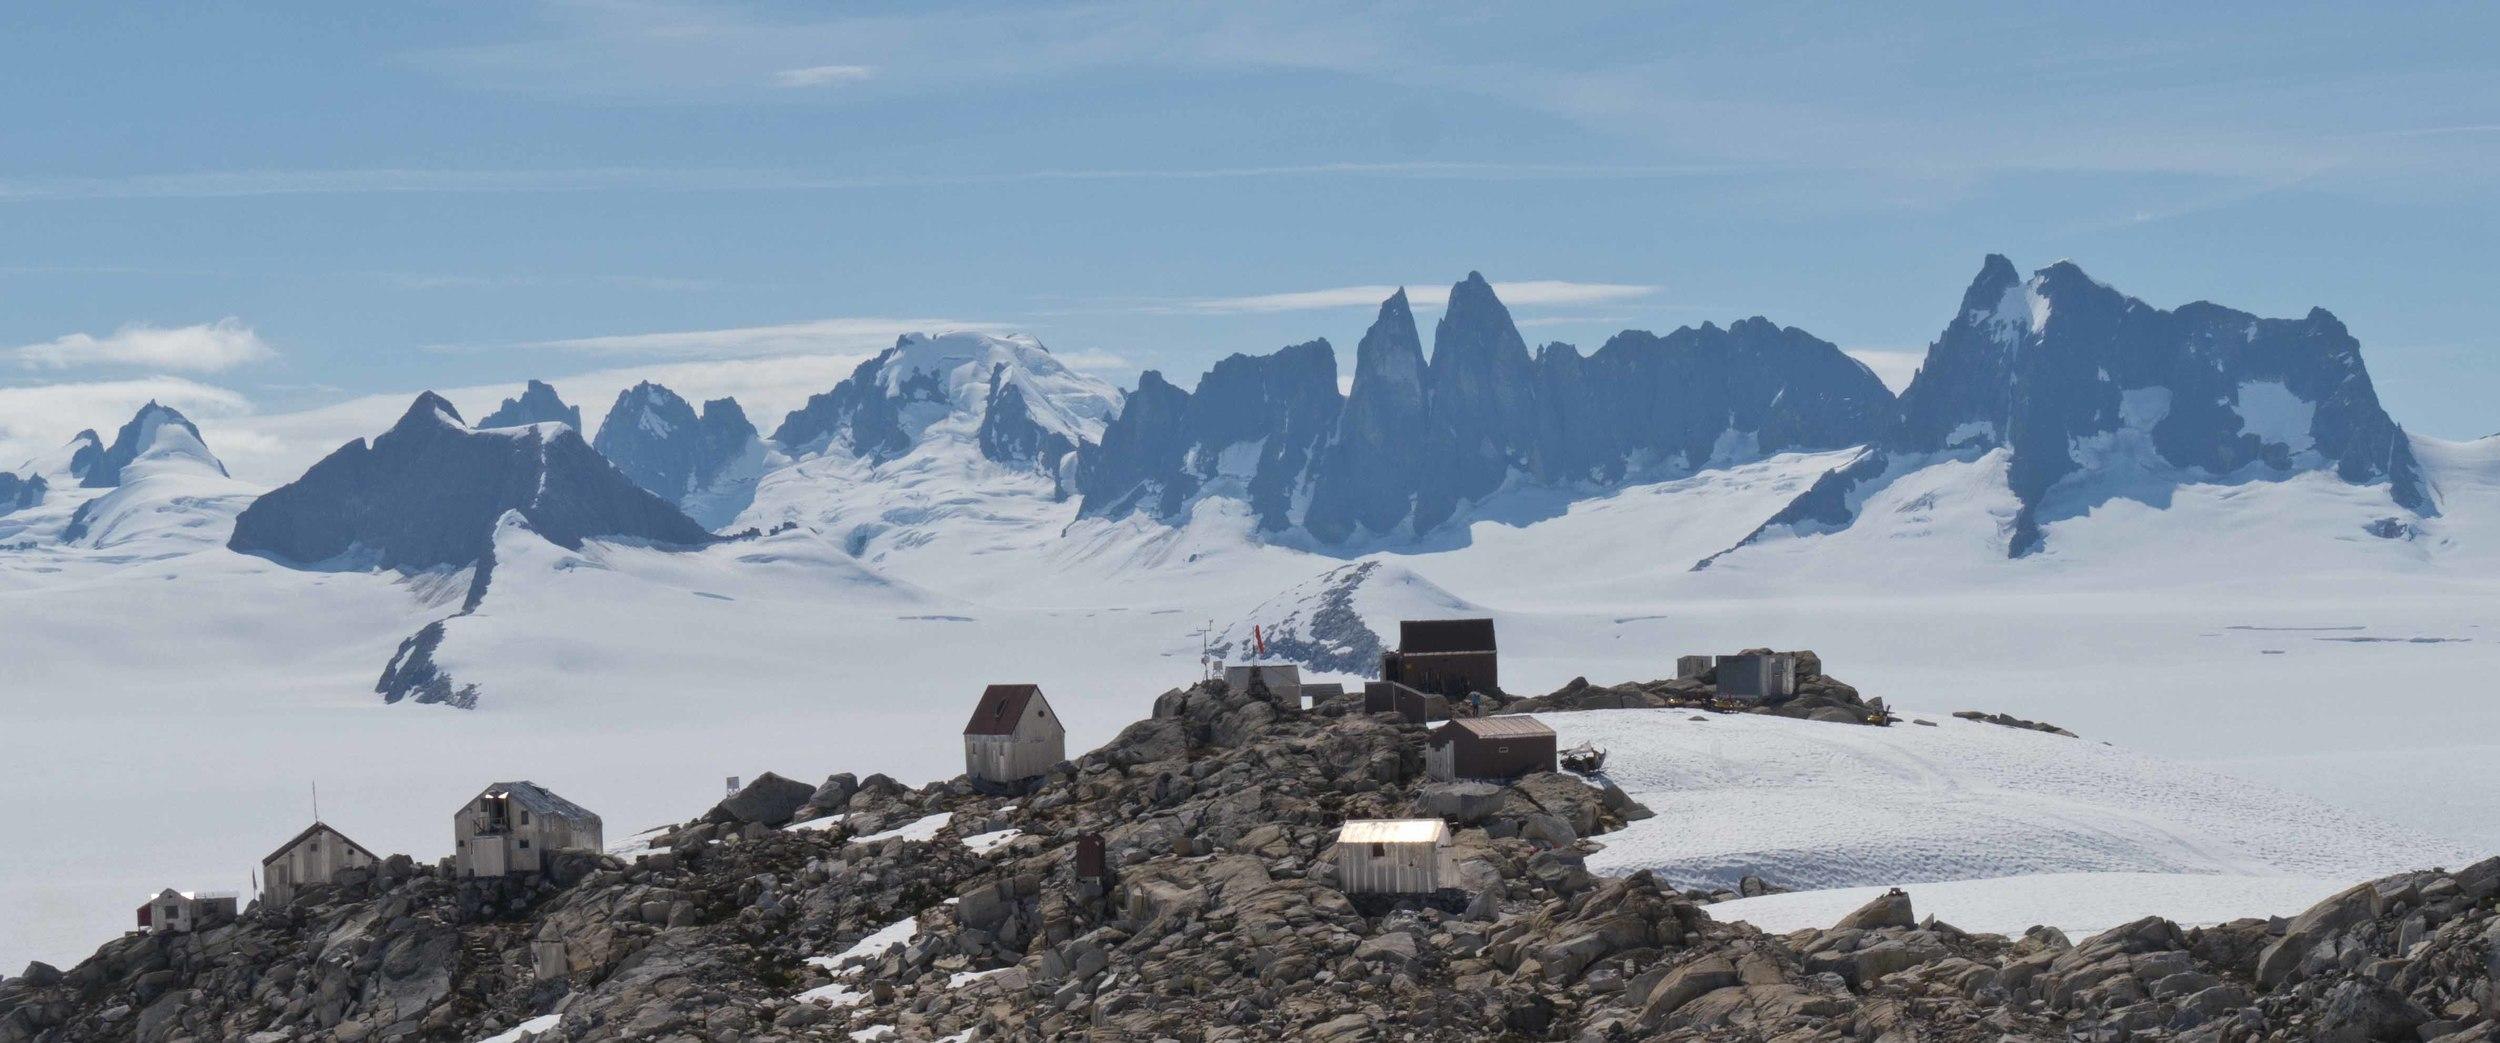 Camp 10 with the Taku Range beyond. Photo by Matt Beedle.